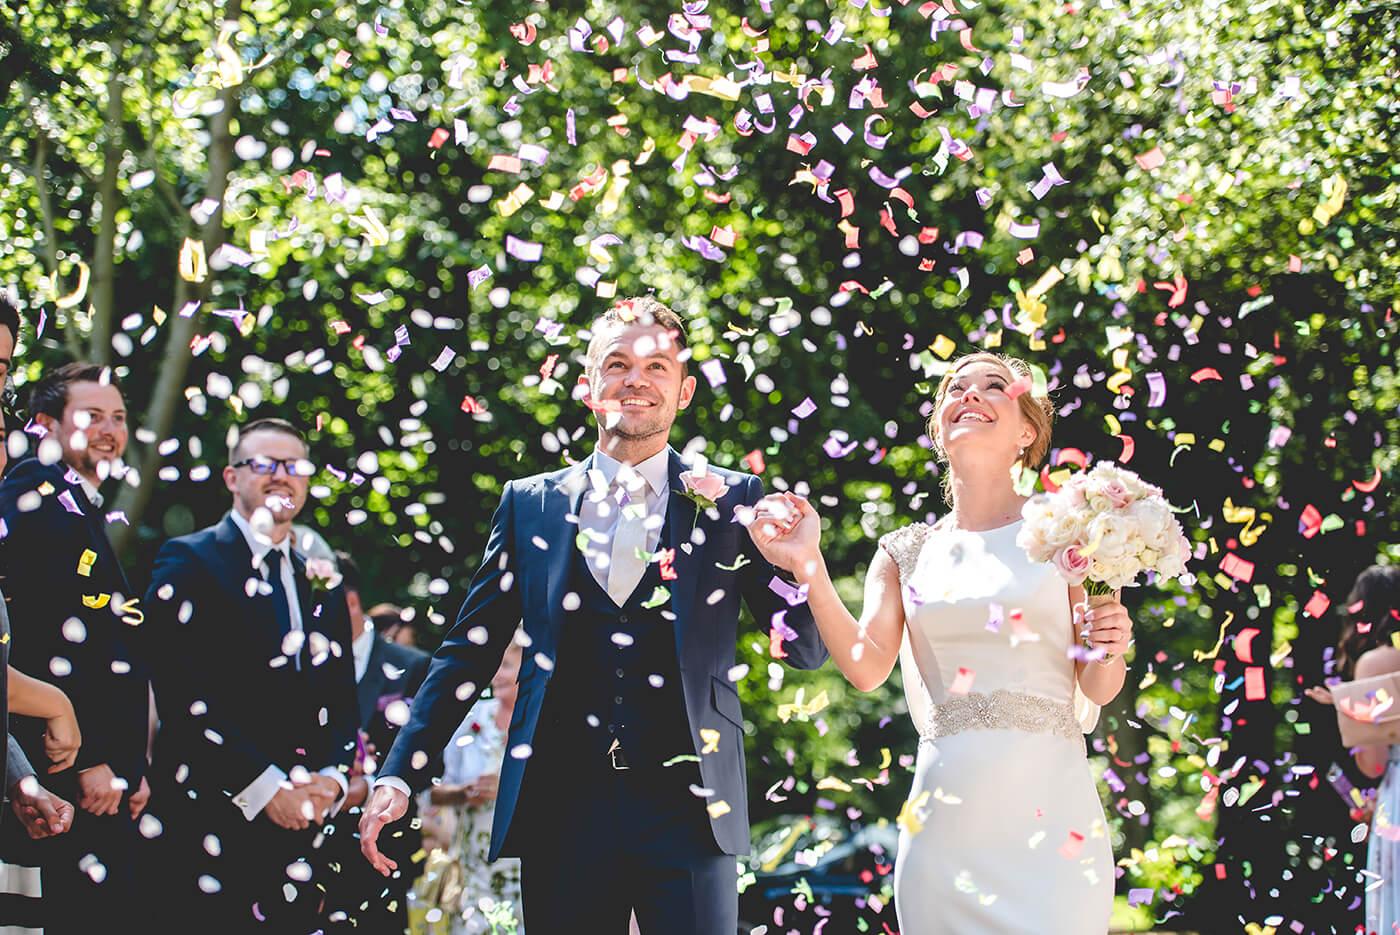 Norfolk wedding Photographer | Liz Bishop Photography